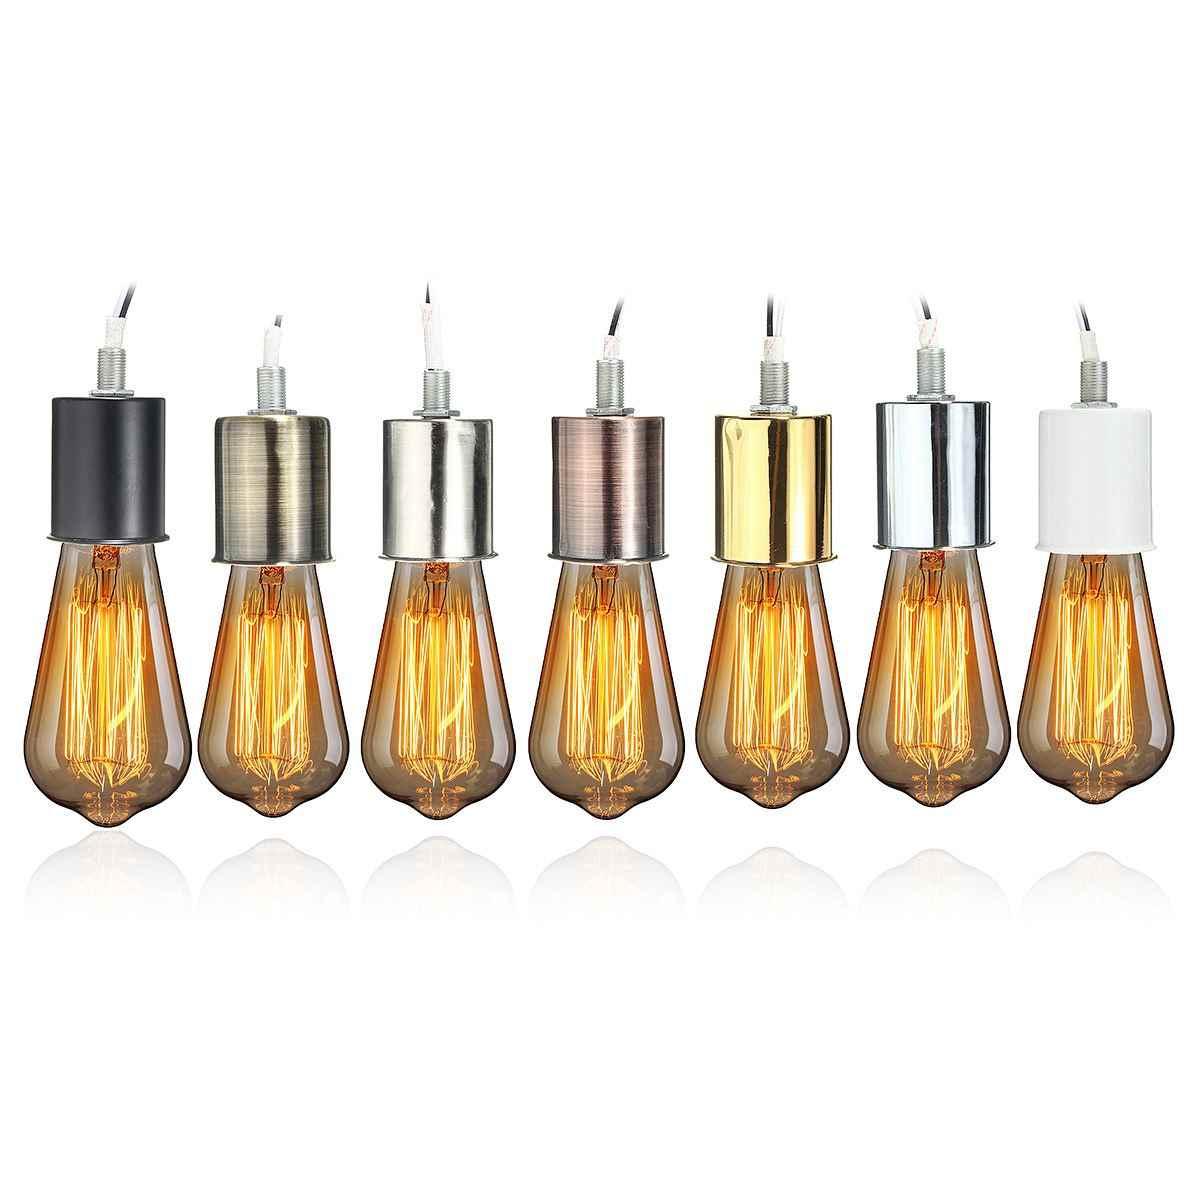 E27 Lamp Base Vintage Retro Antique Edison Ceramic Screw Bulb Hang Socket Lamp Base Holder Light Fitting With Wire 230V